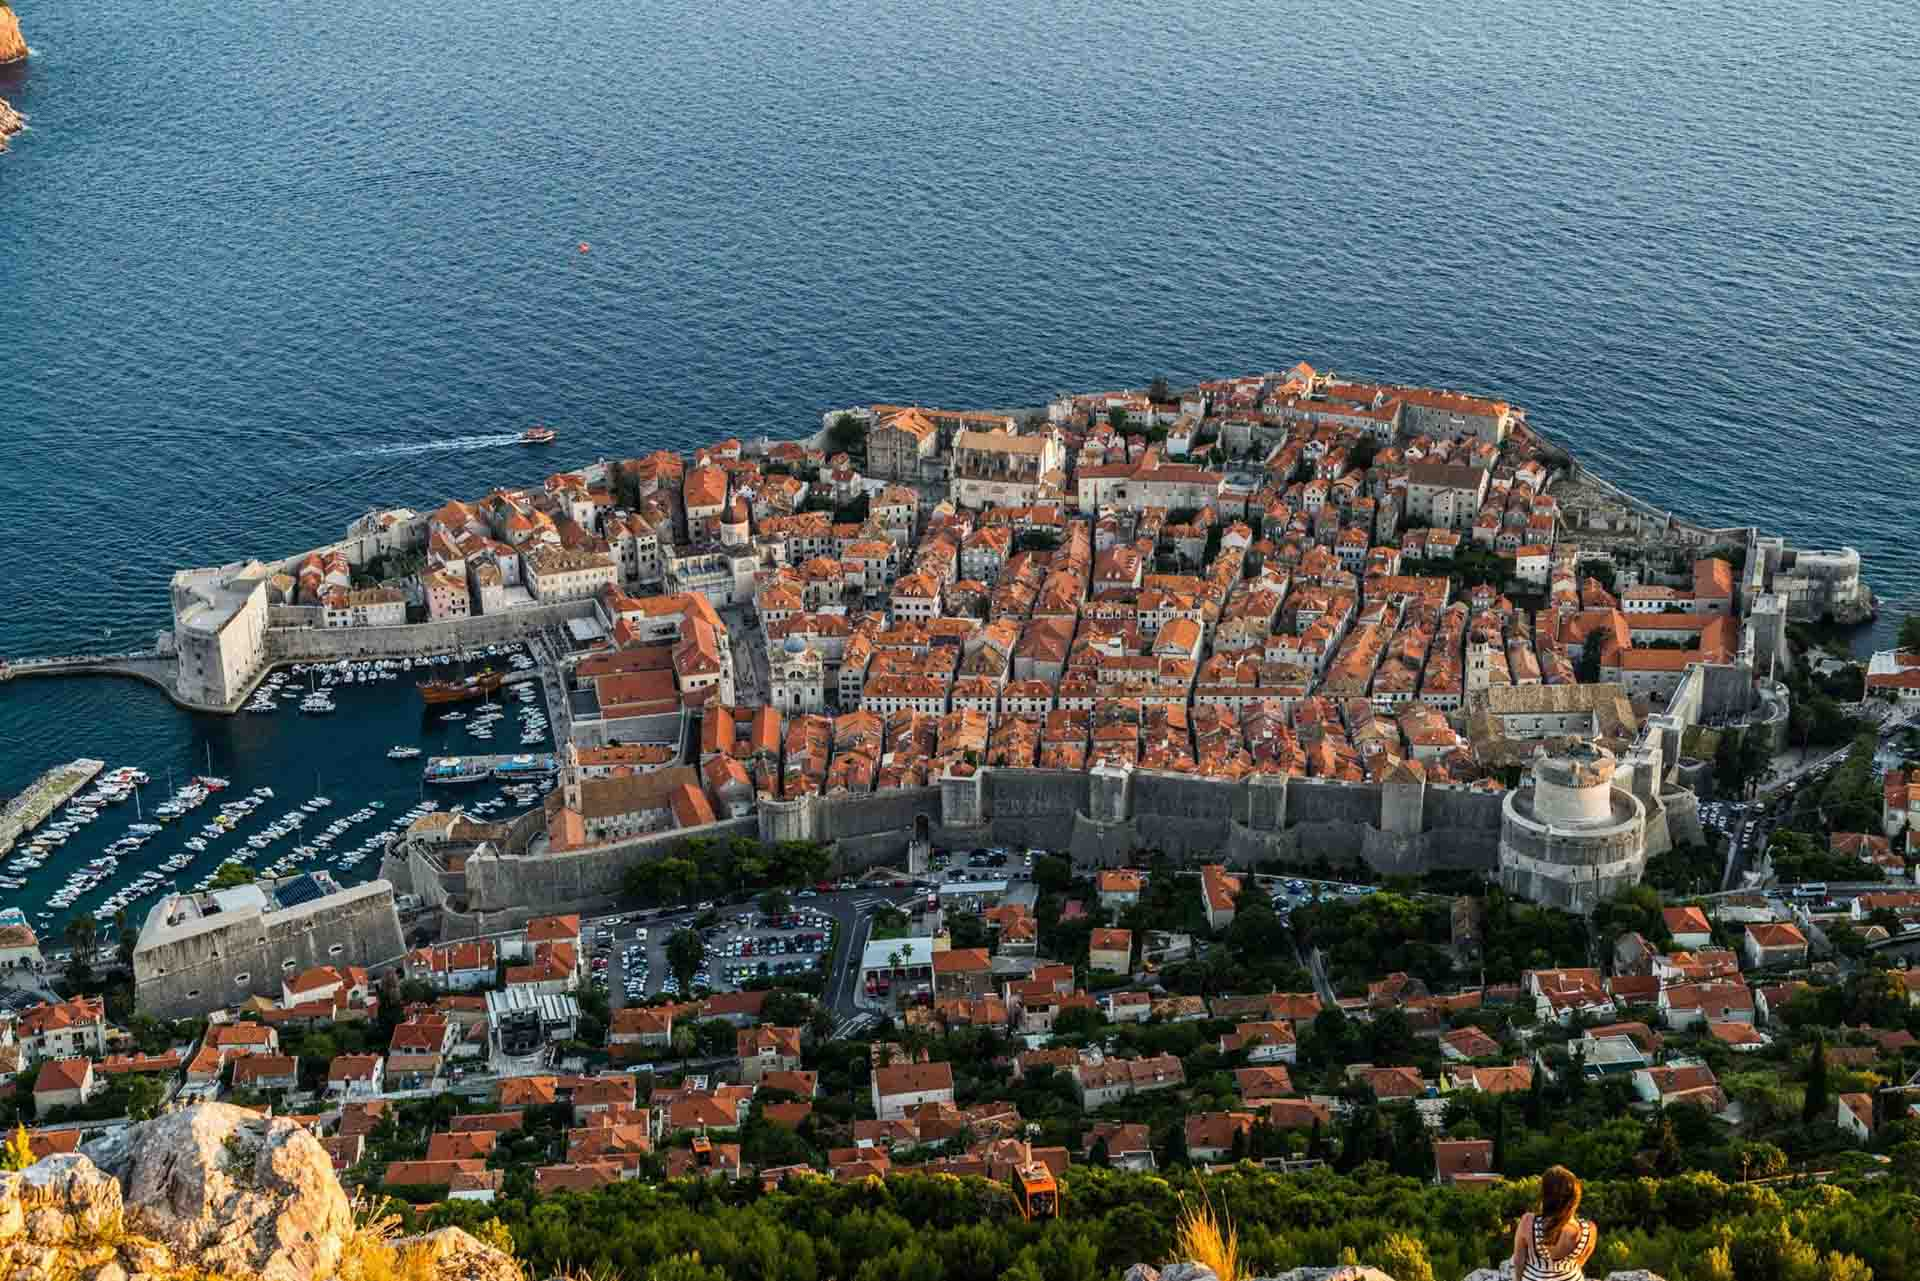 Croatia Dubrovnik from Panorama Restaurant, dubrovnik, croatia, pescart, photo blog, travel blog, blog, photo travel blog, enrico pescantini, pescantini